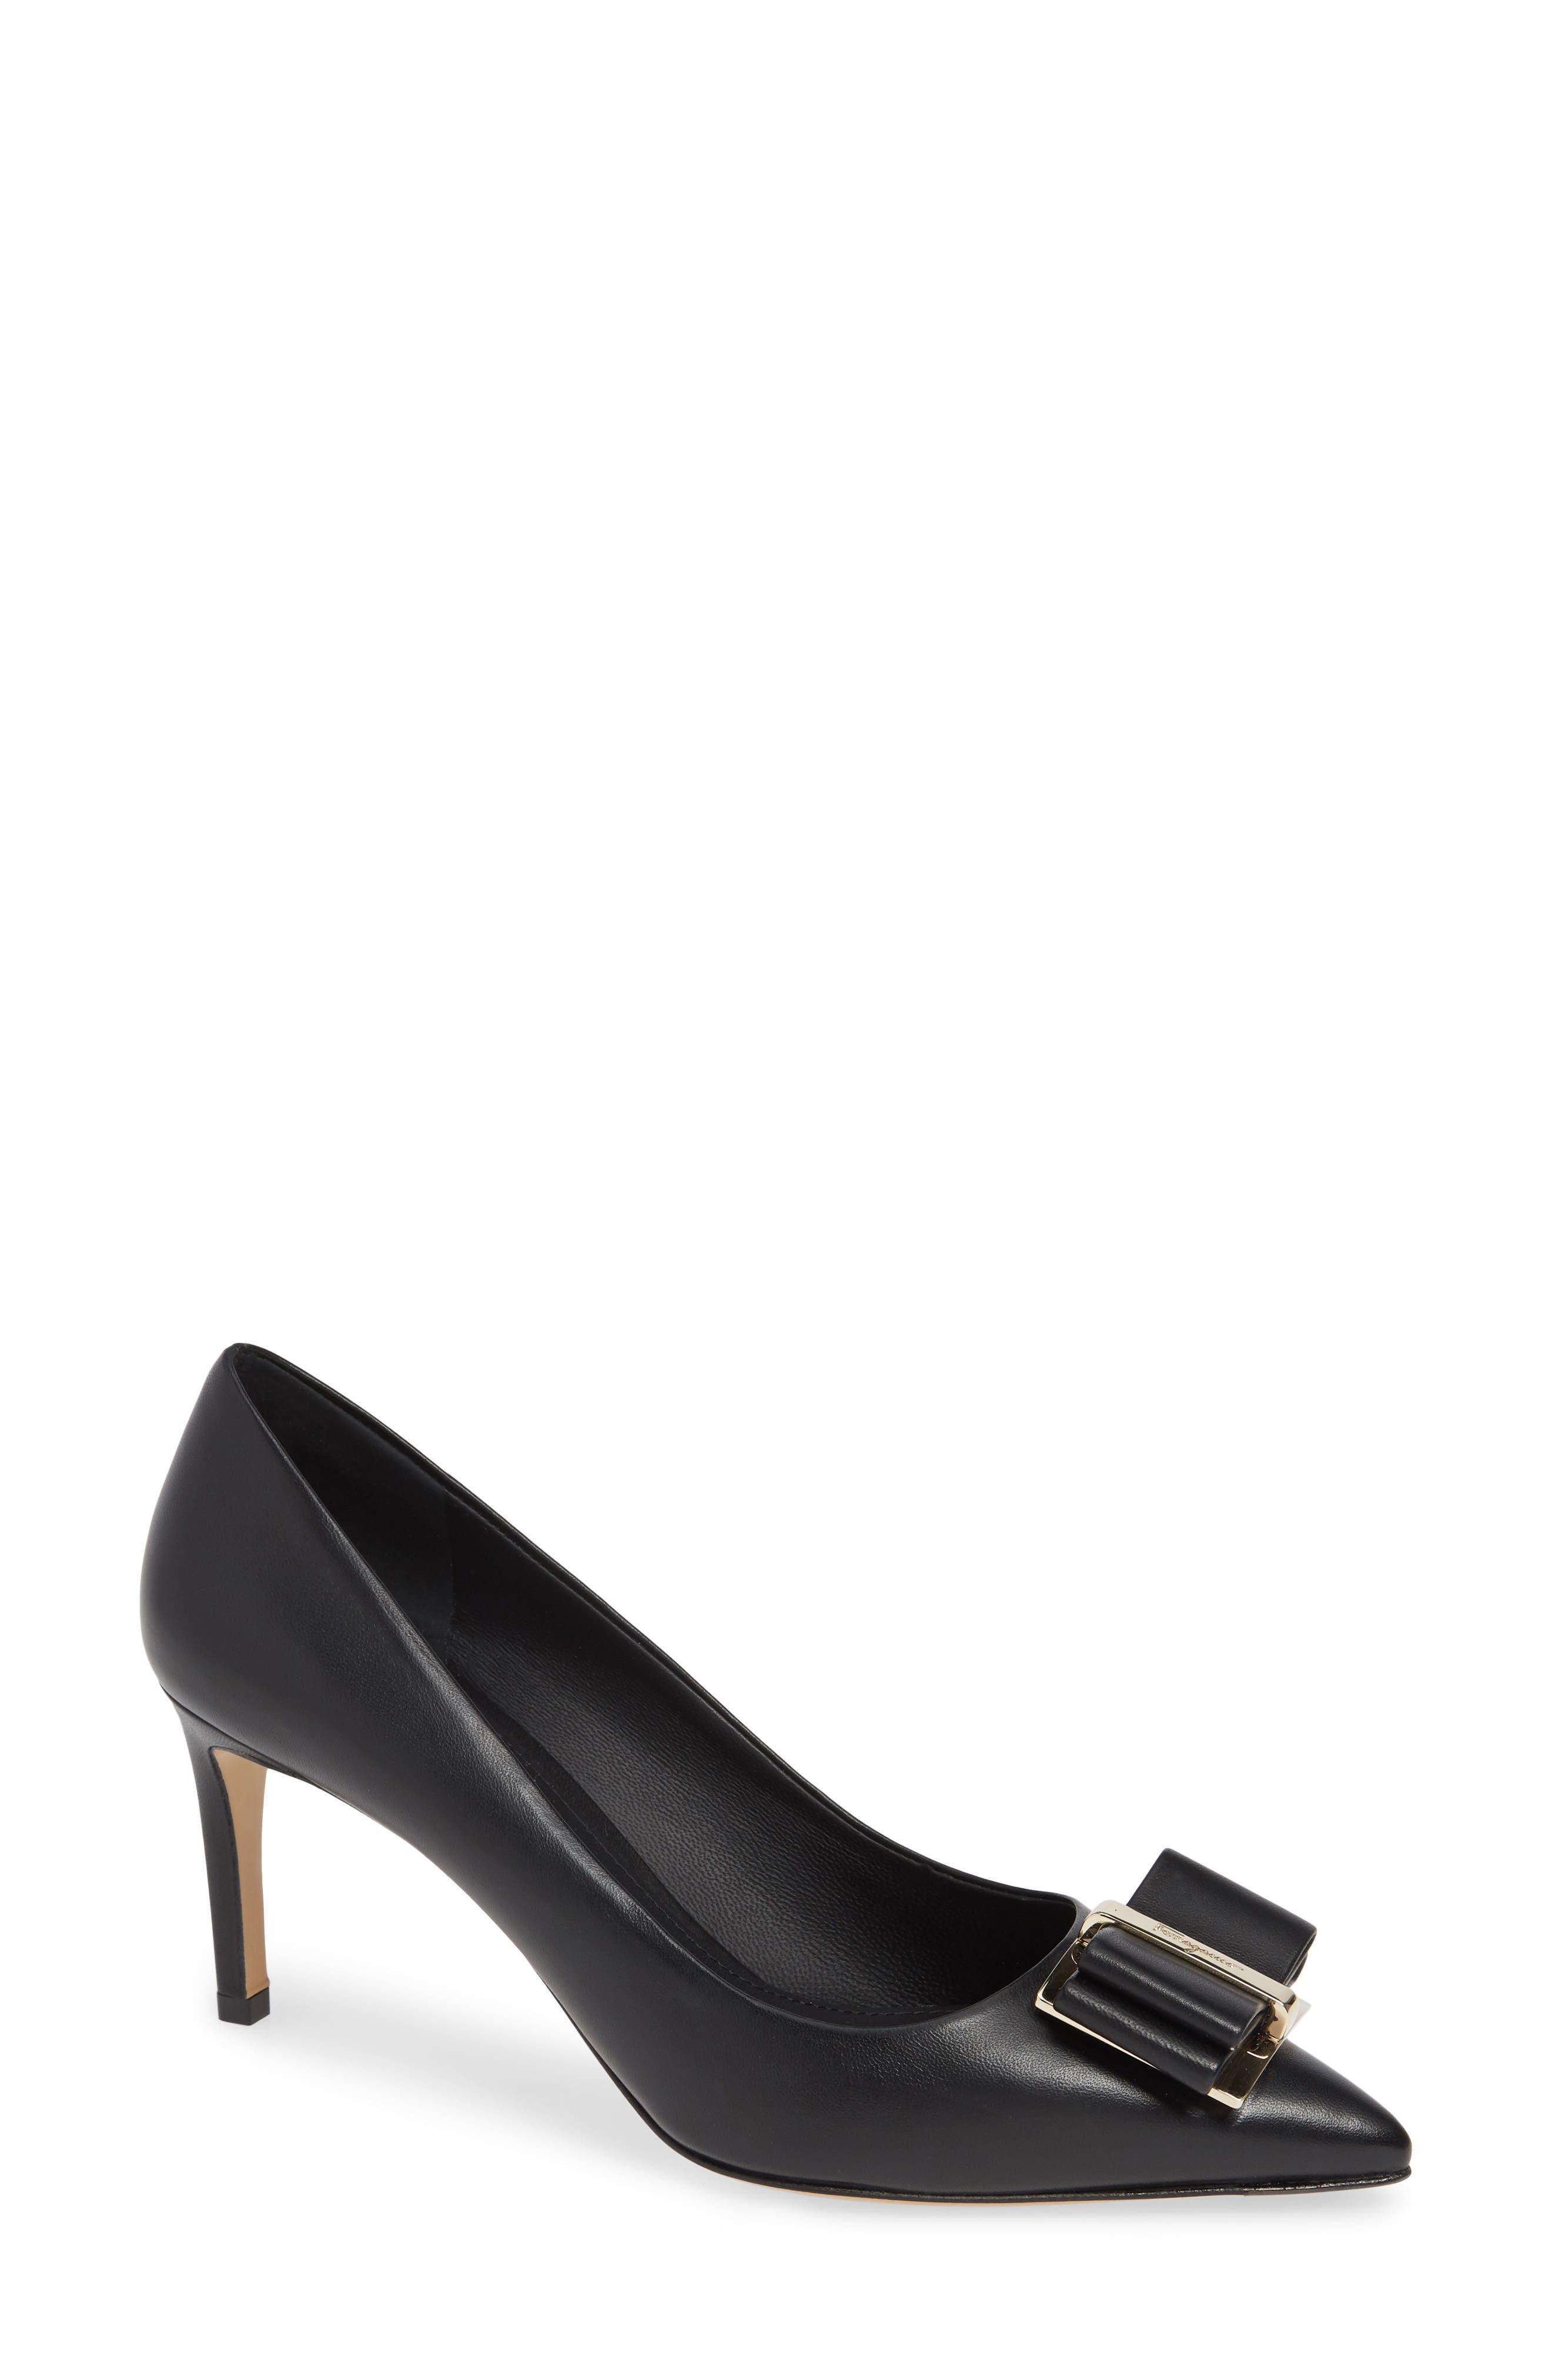 Zeri Mid-Heel Leather Bow Pumps in Black